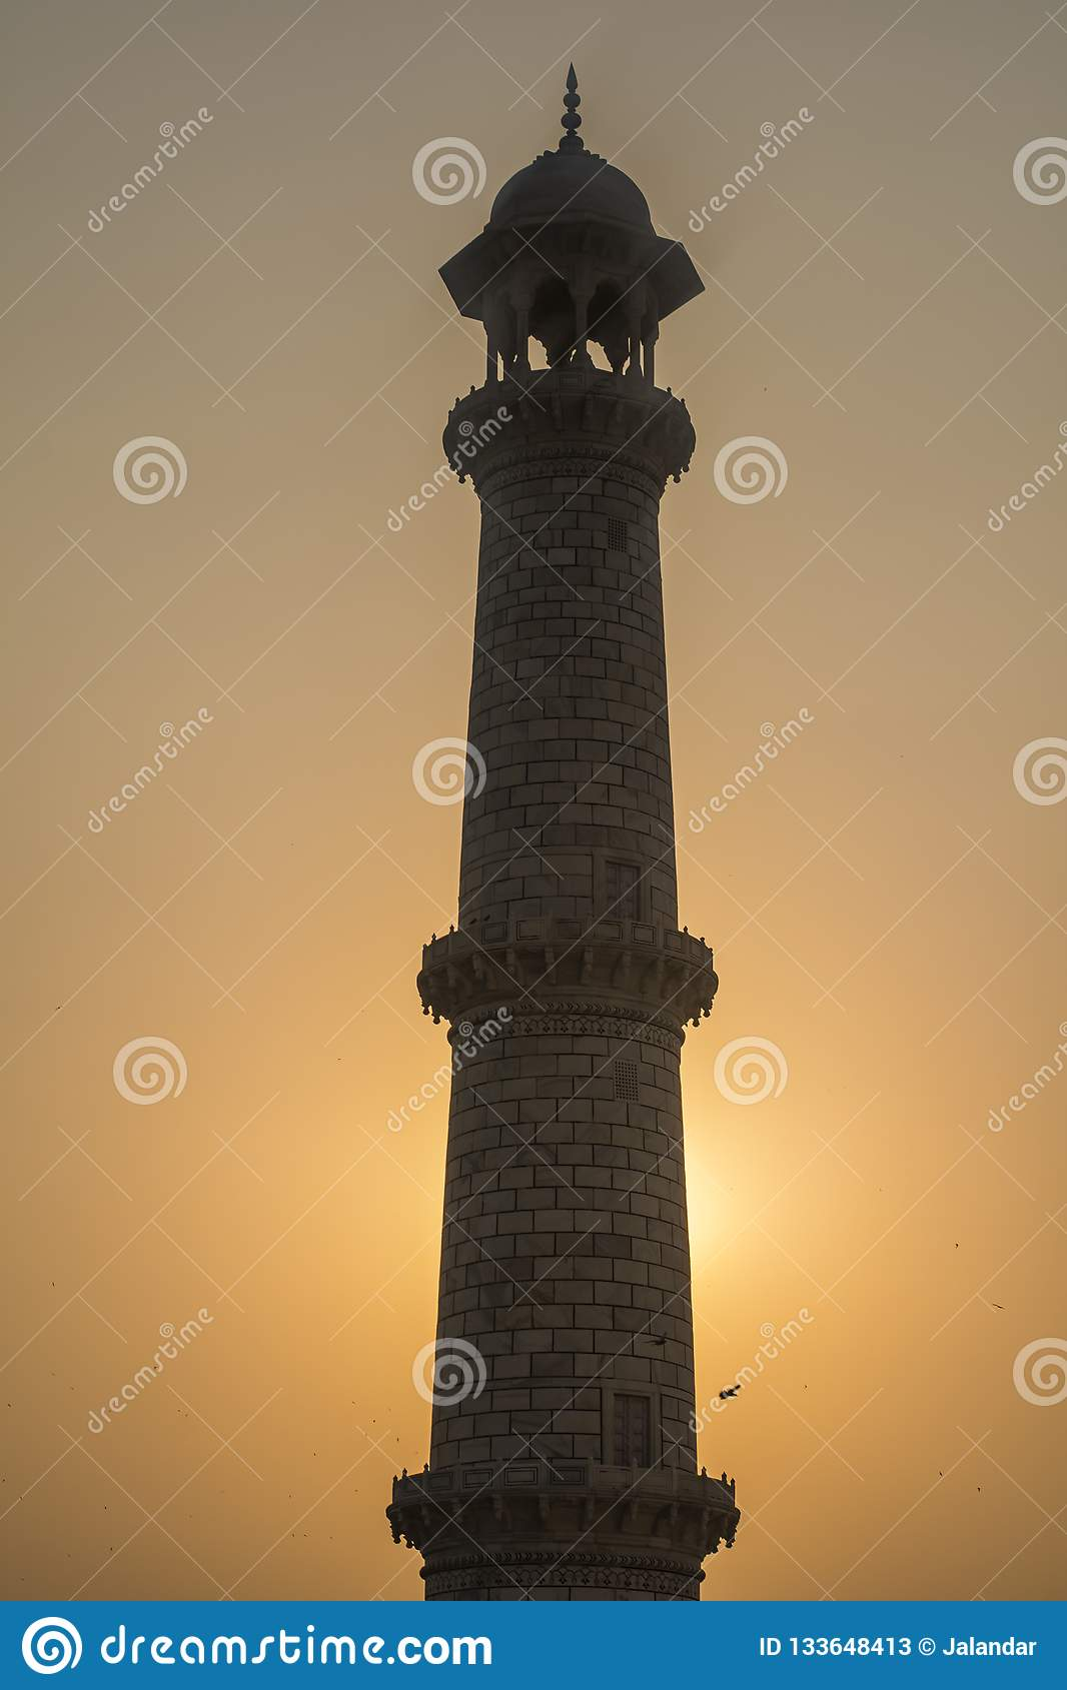 Pelare av Taj Mahal Silhoutte View, med solnedgång bakom